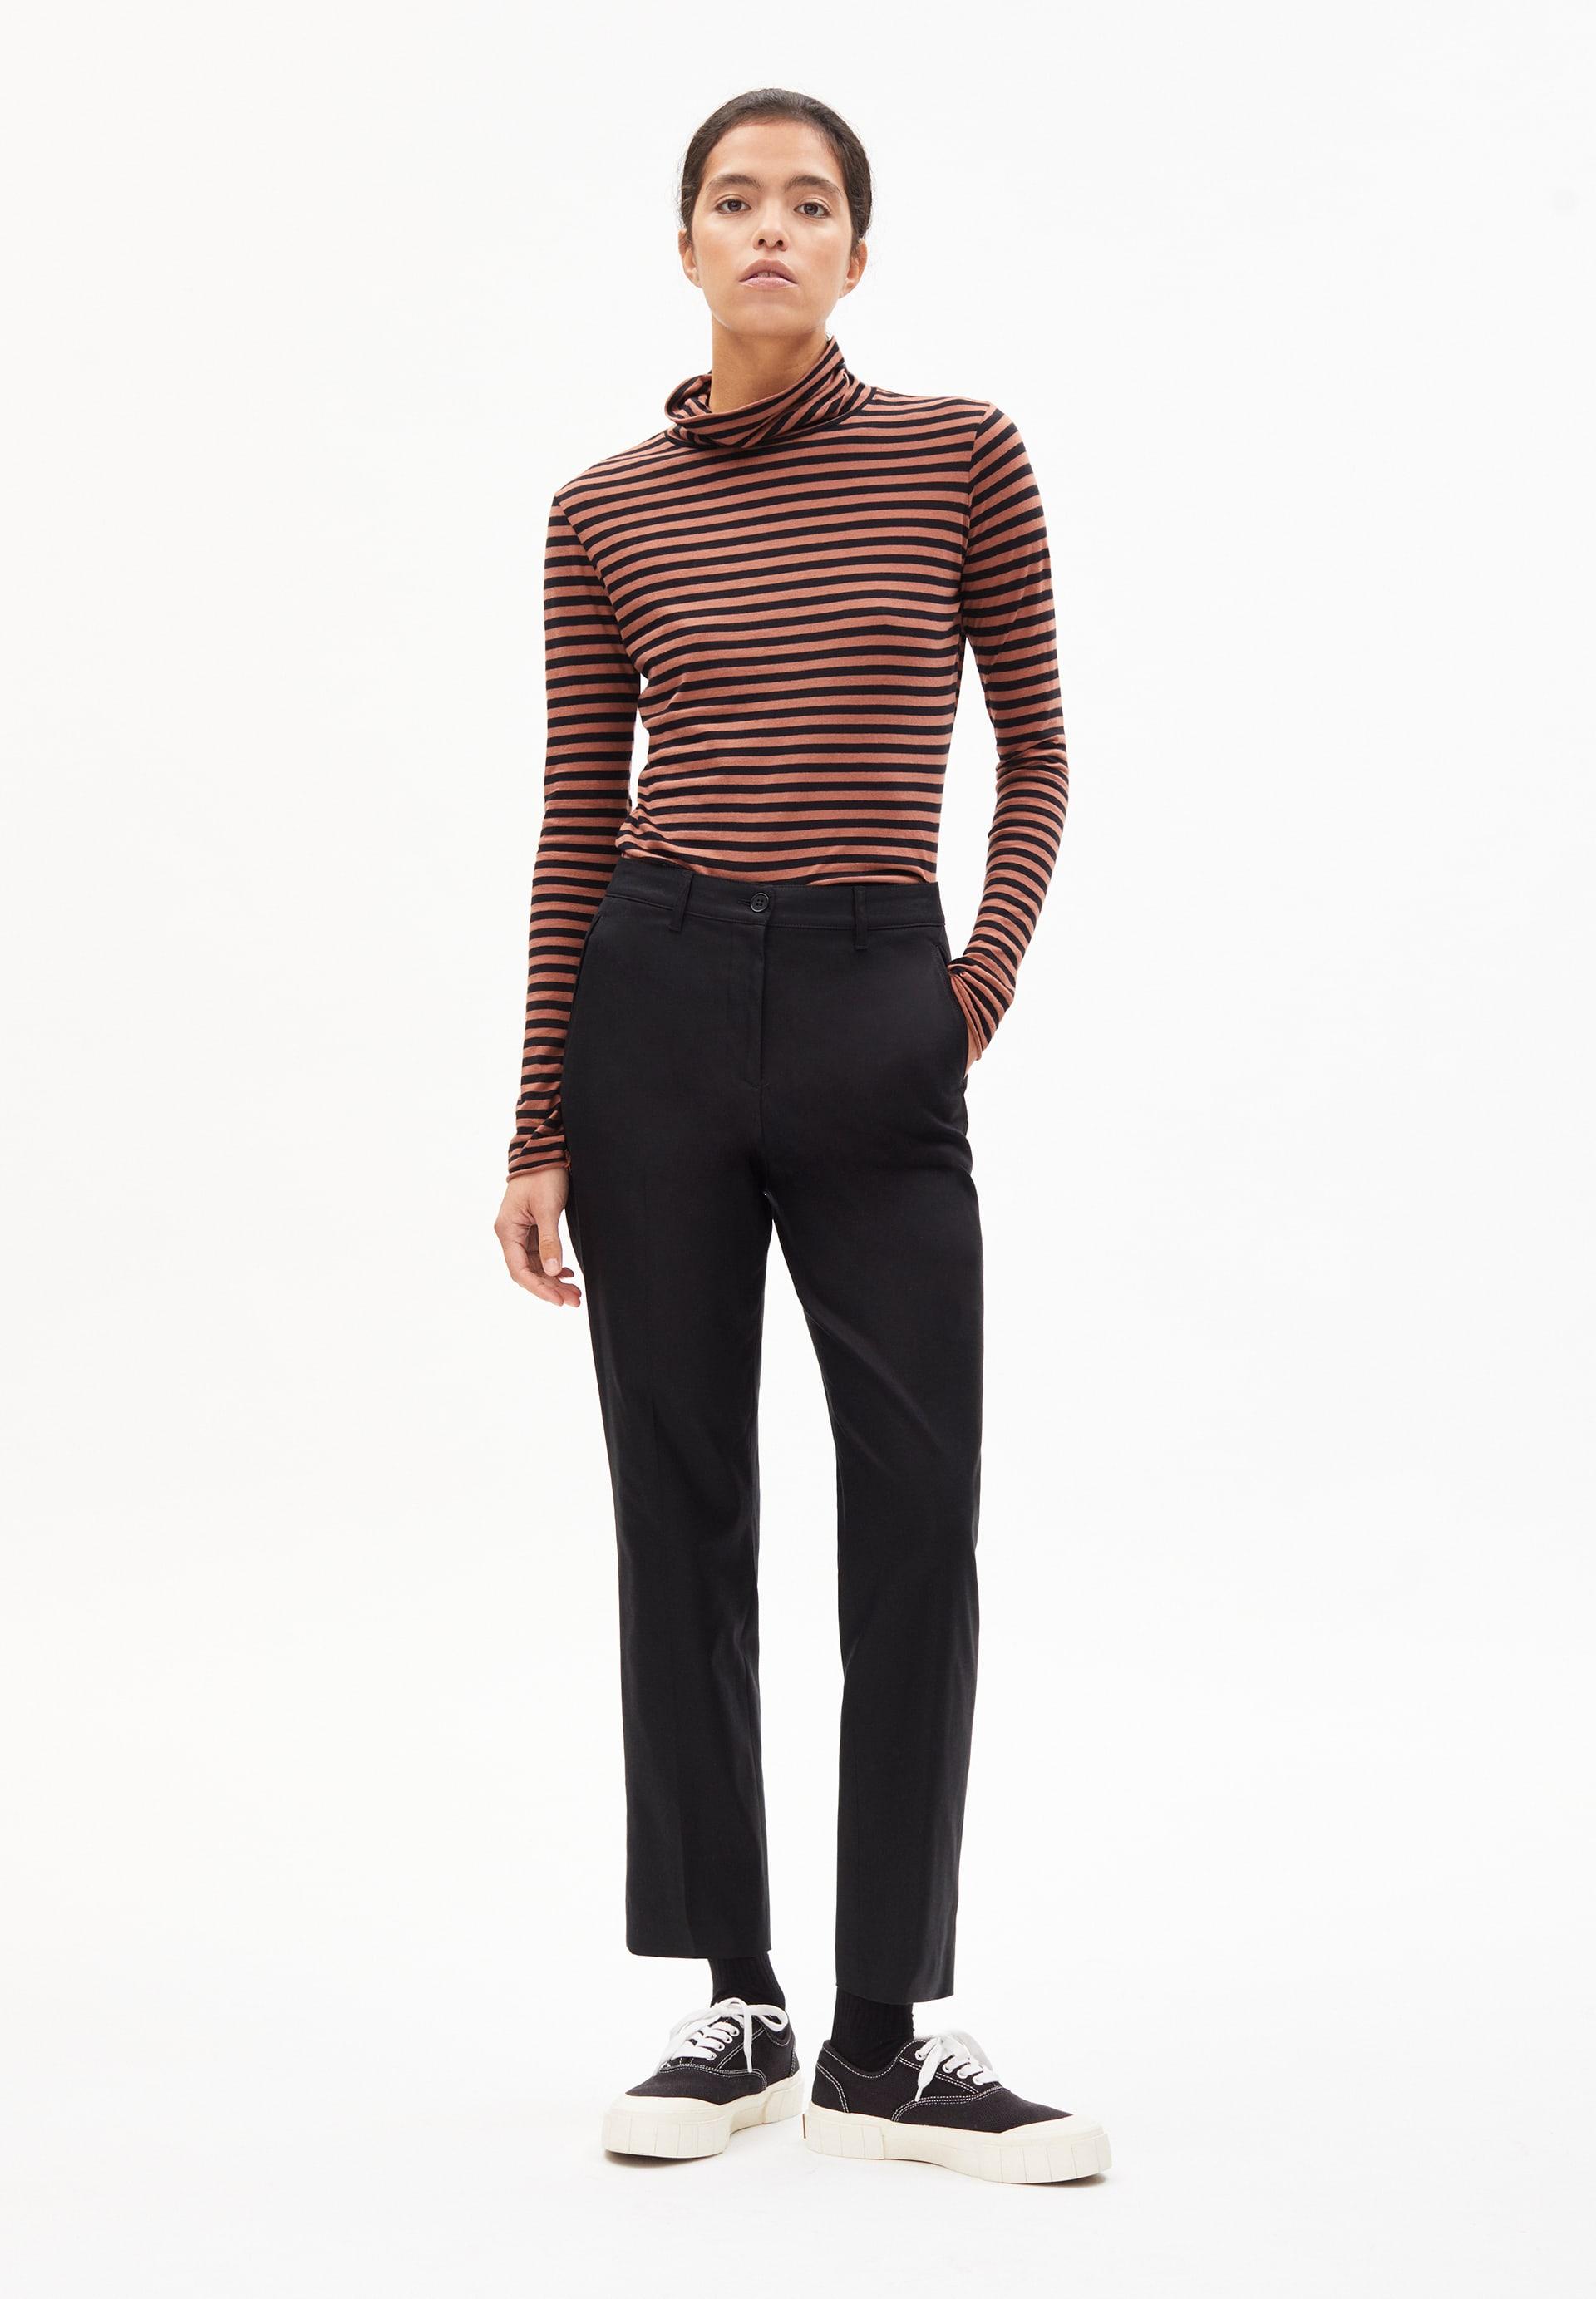 VARMAA SOLID Pants made of Organic Cotton Mix